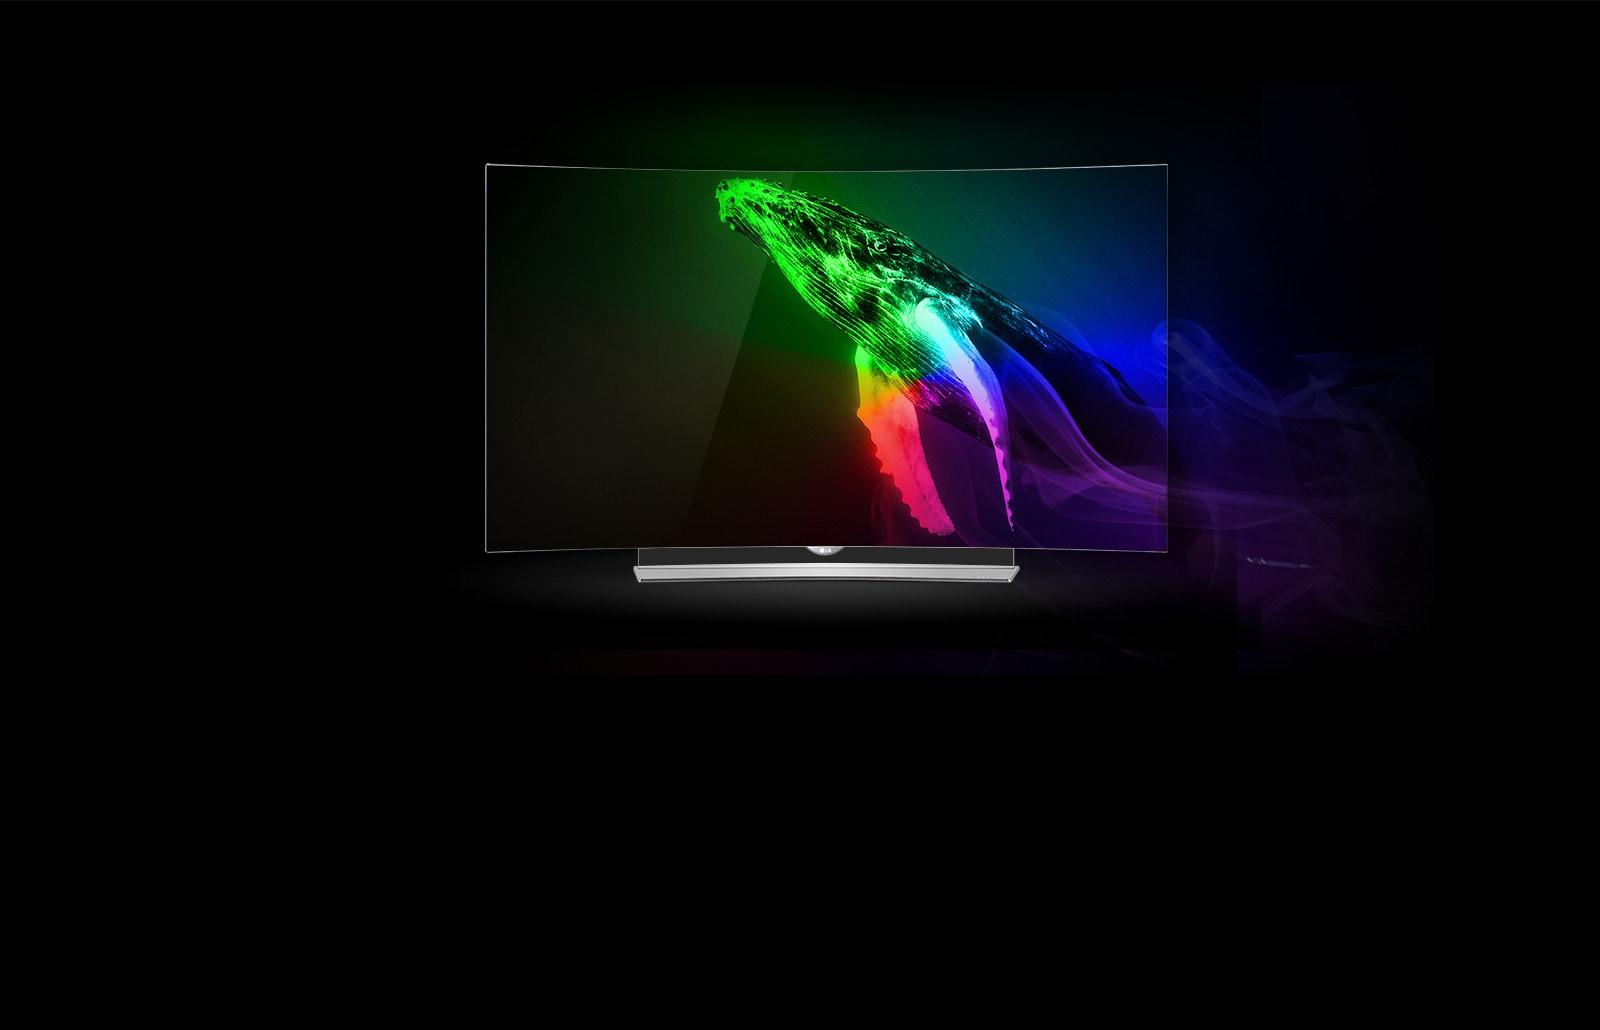 tvs lg oled ultra hd 4k smart tv led e mais lg brasil. Black Bedroom Furniture Sets. Home Design Ideas